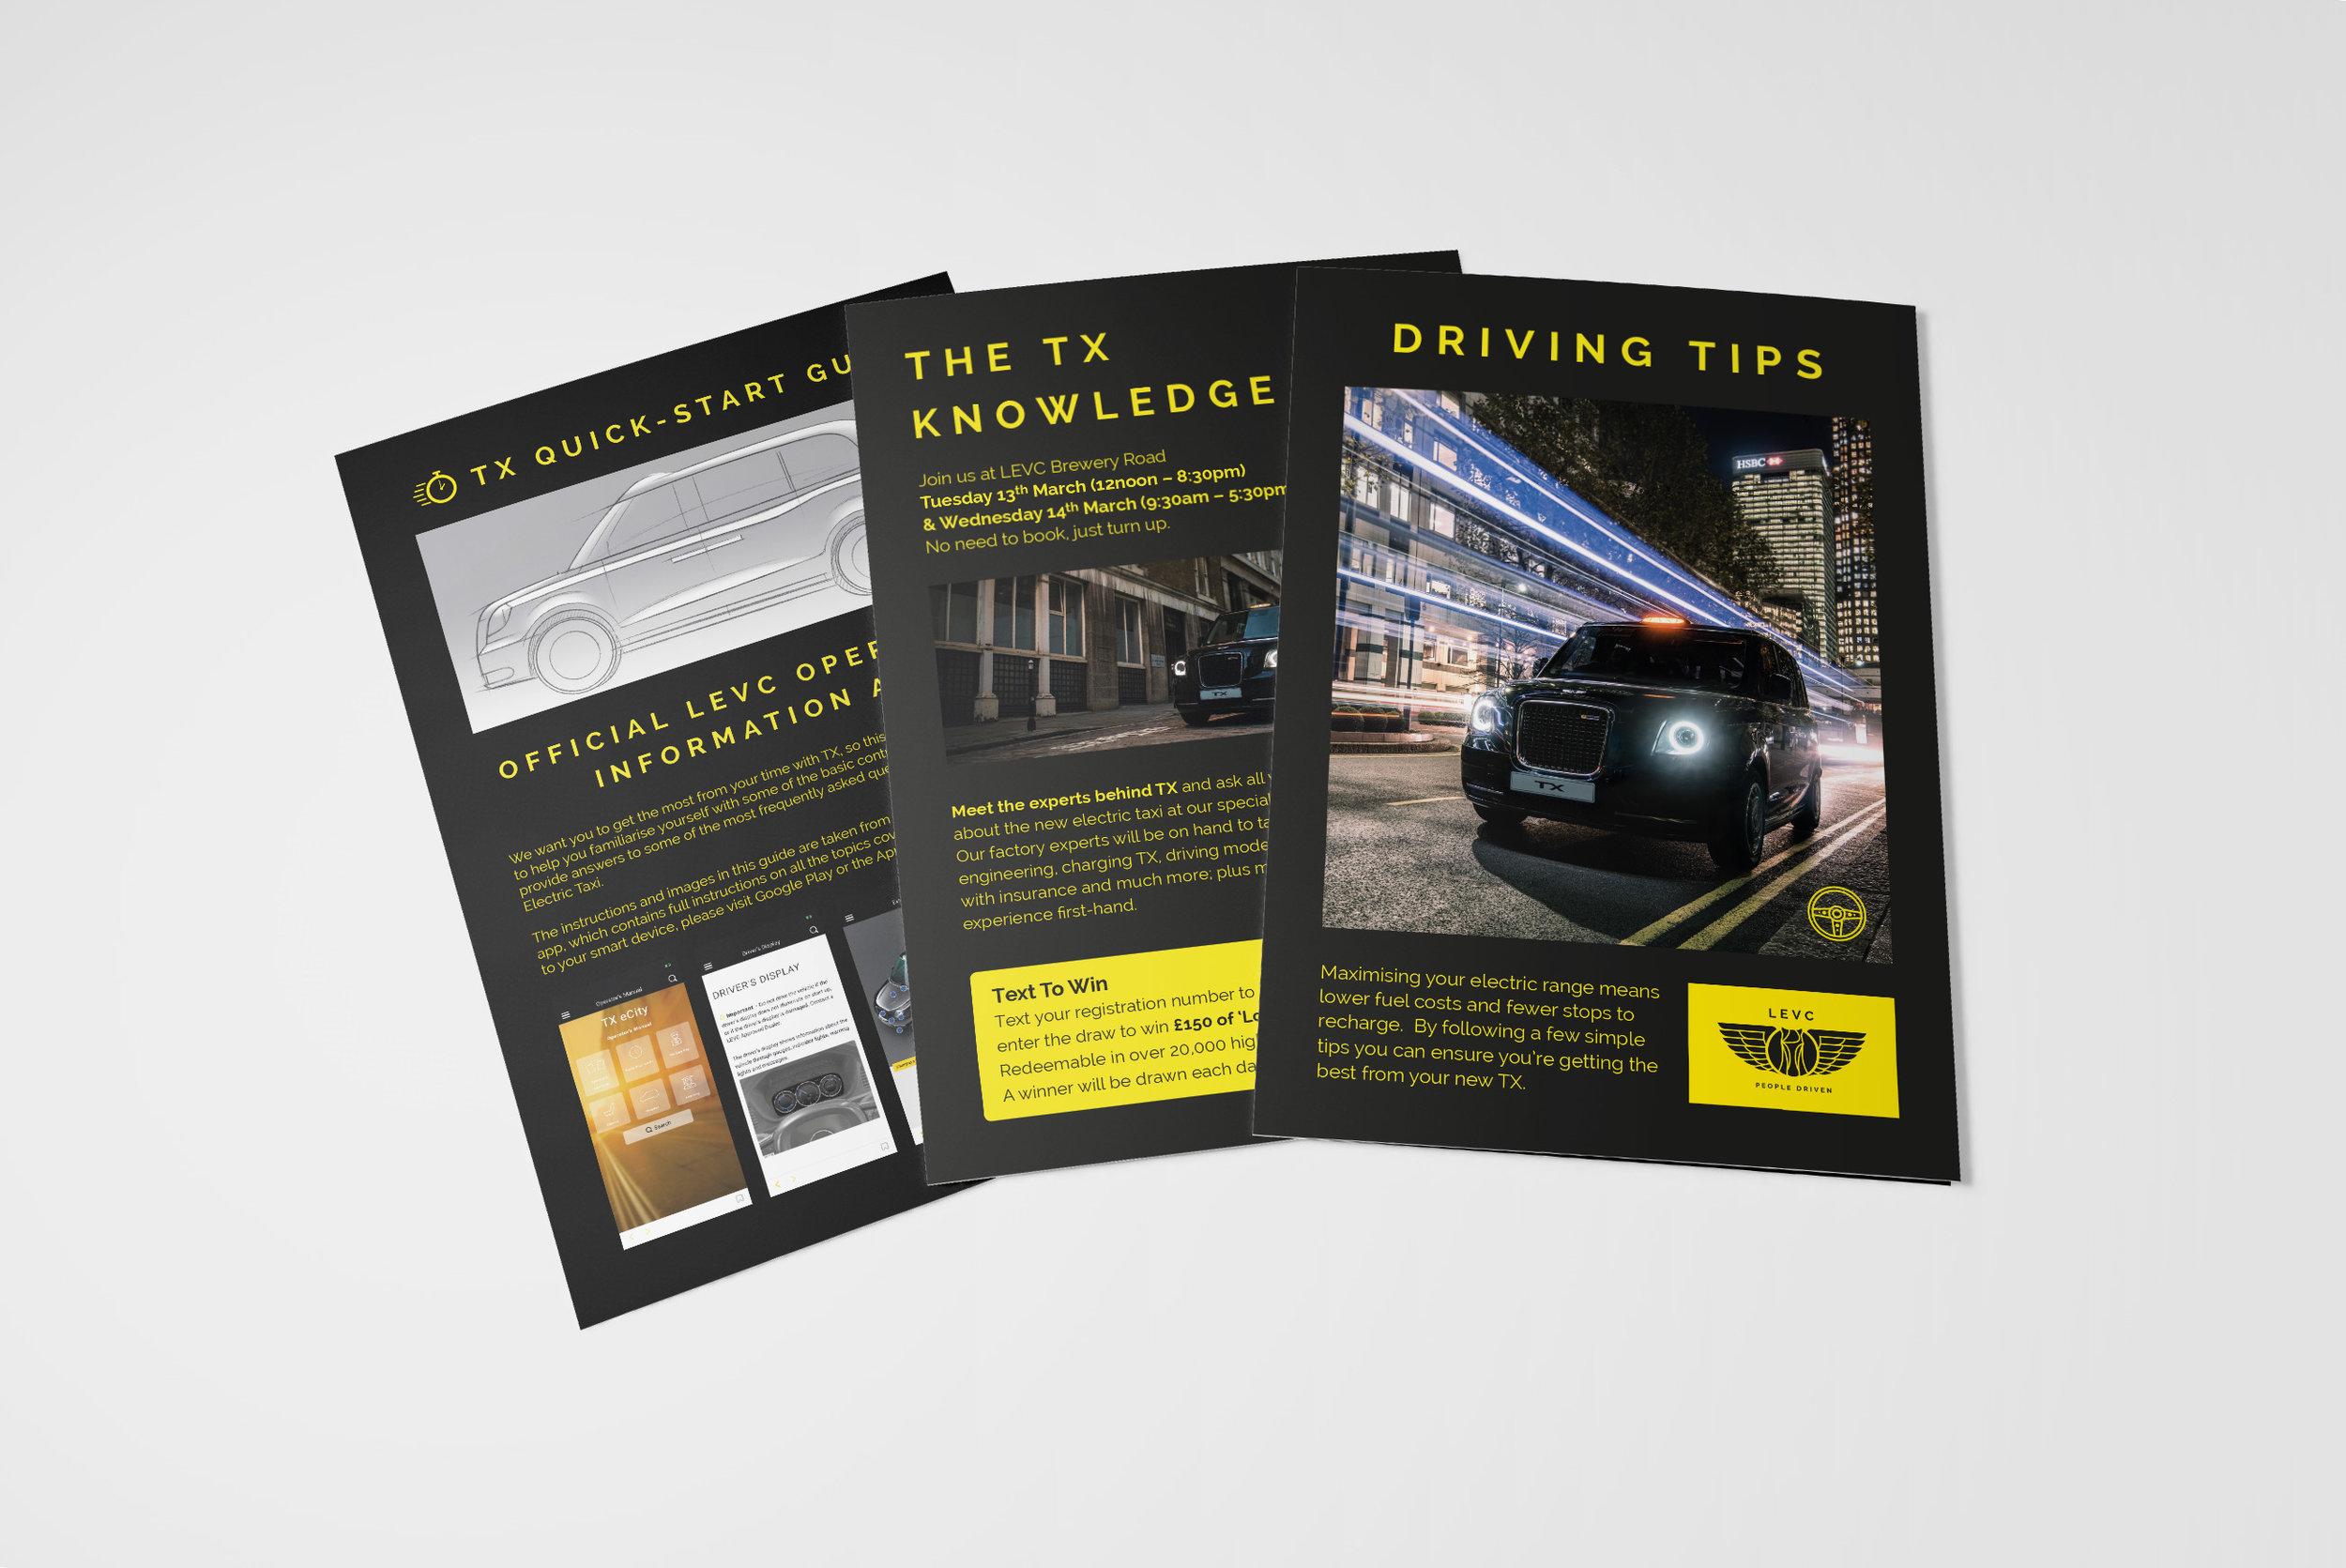 LEVC leaflets.jpg